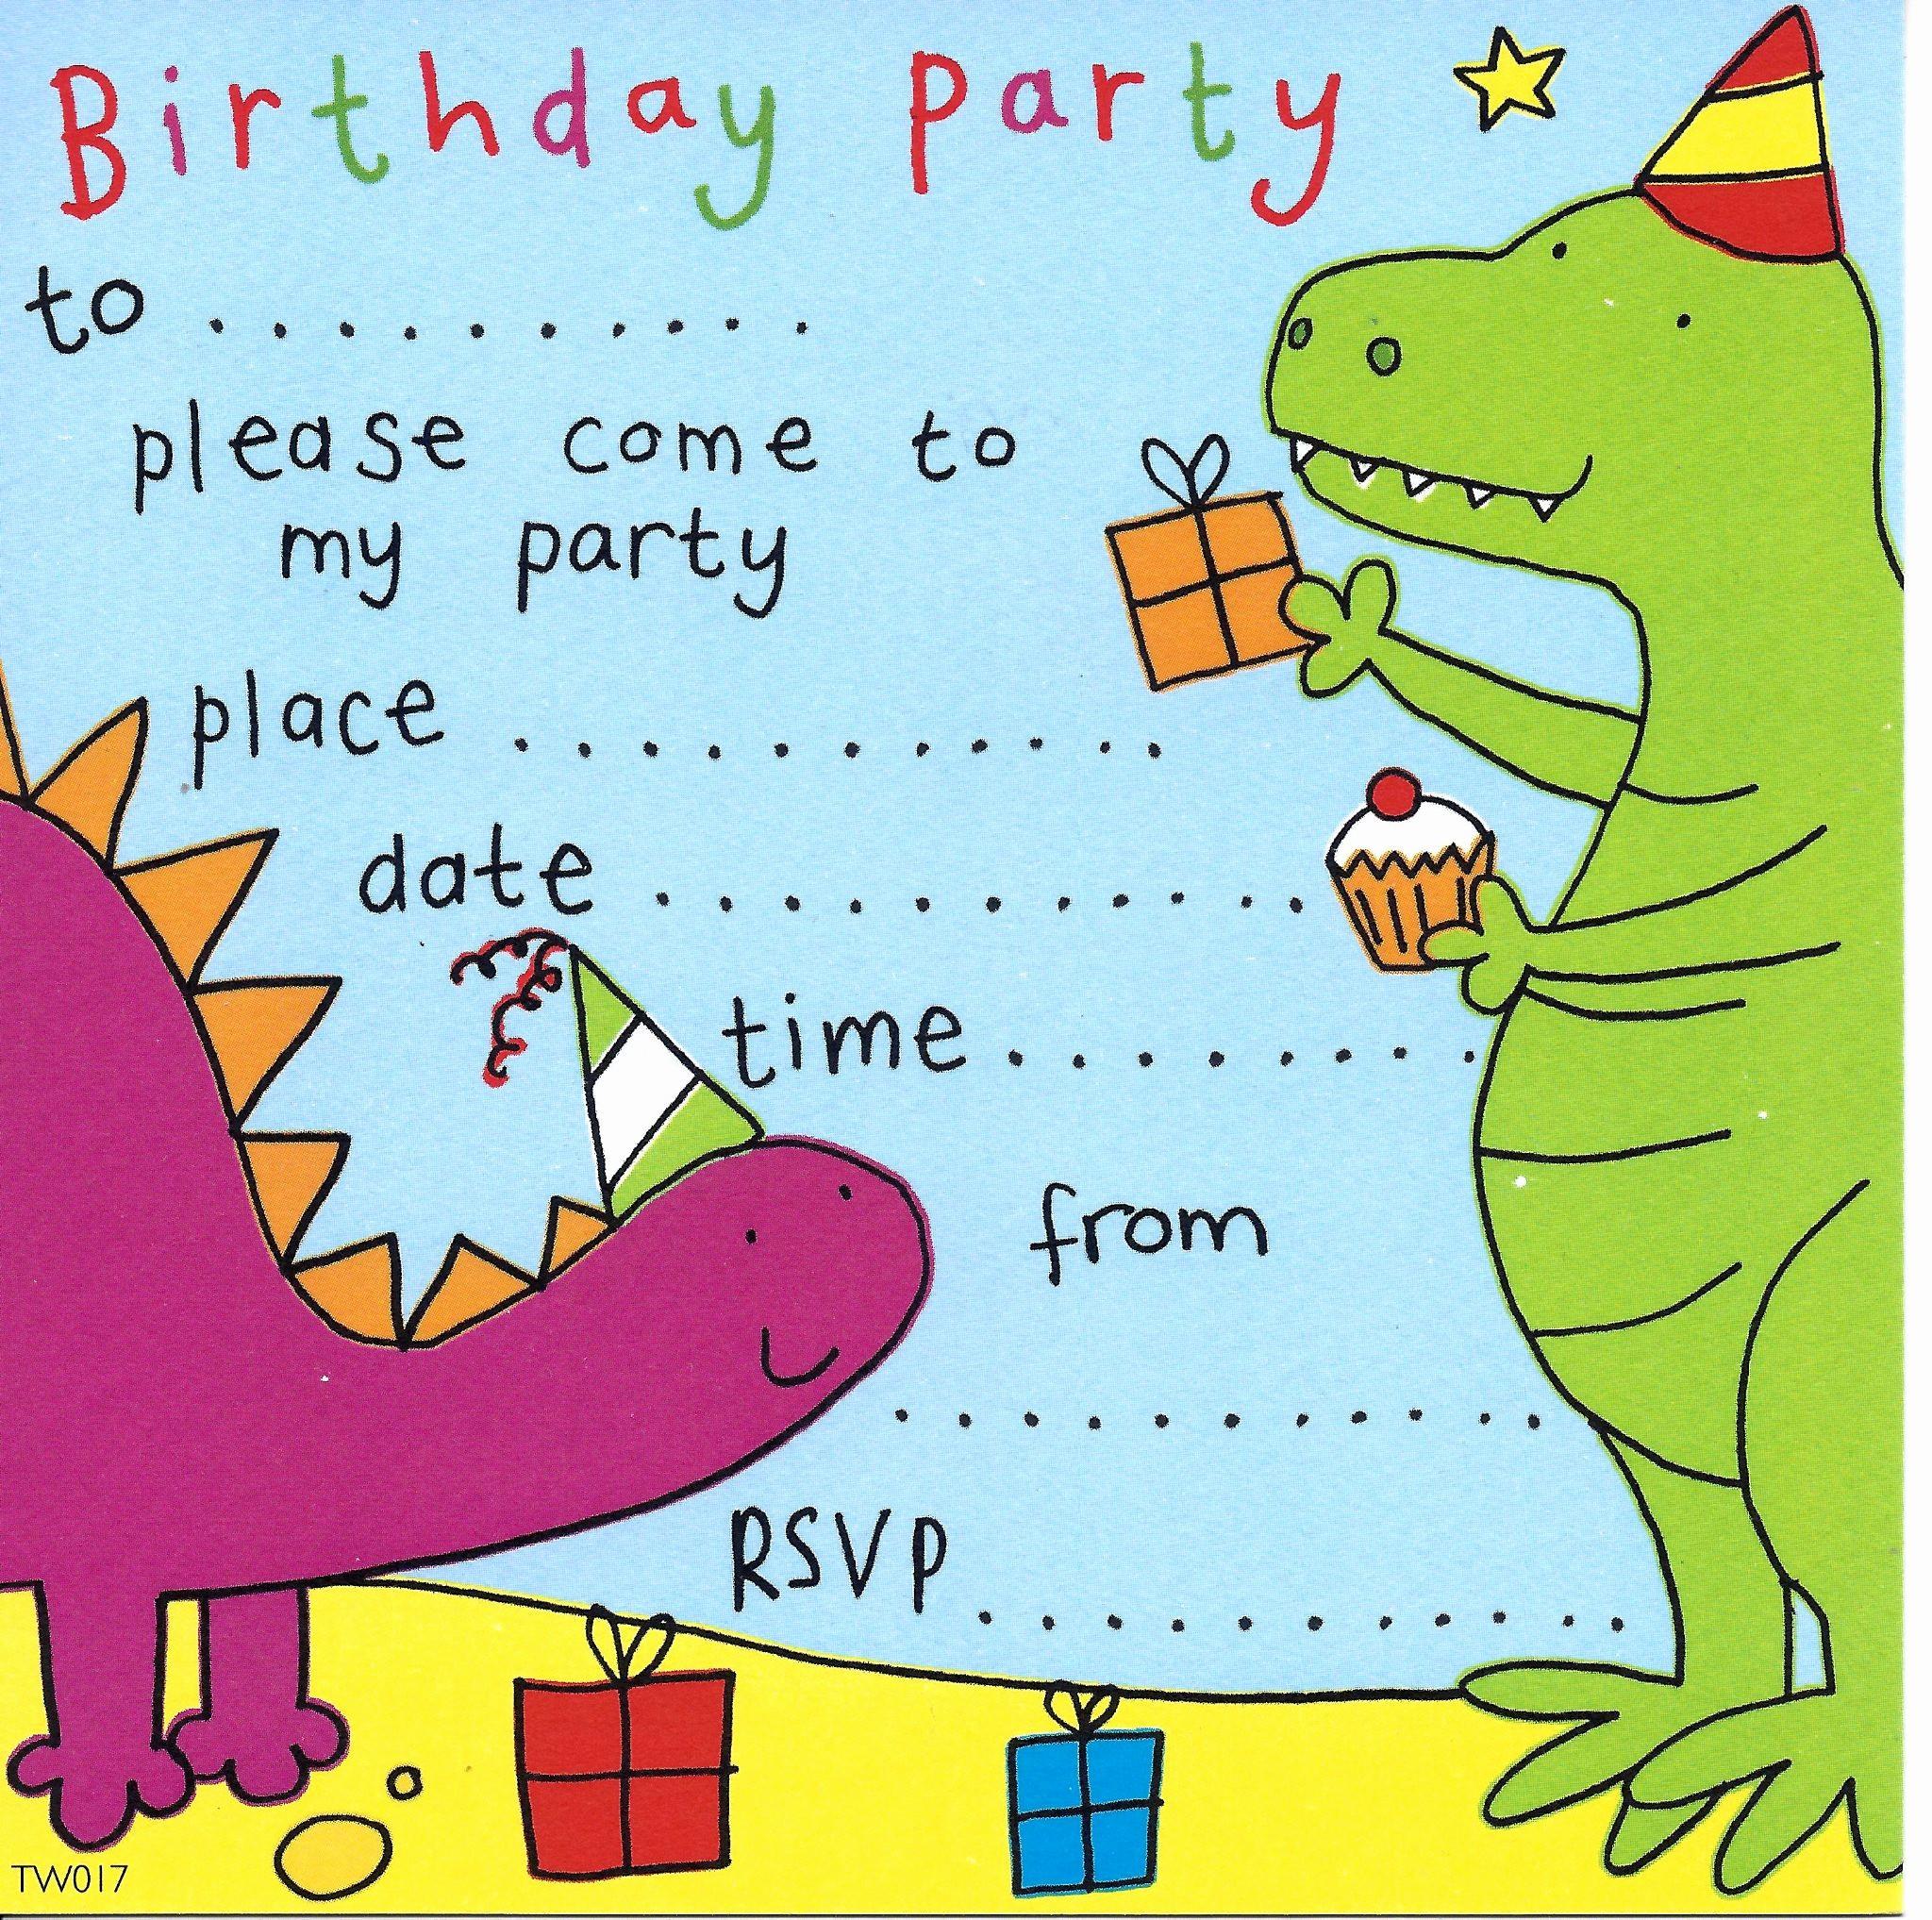 Invitation format for Birthday Party Fresh Party Invitations Birthday Party Invitations Kids Party